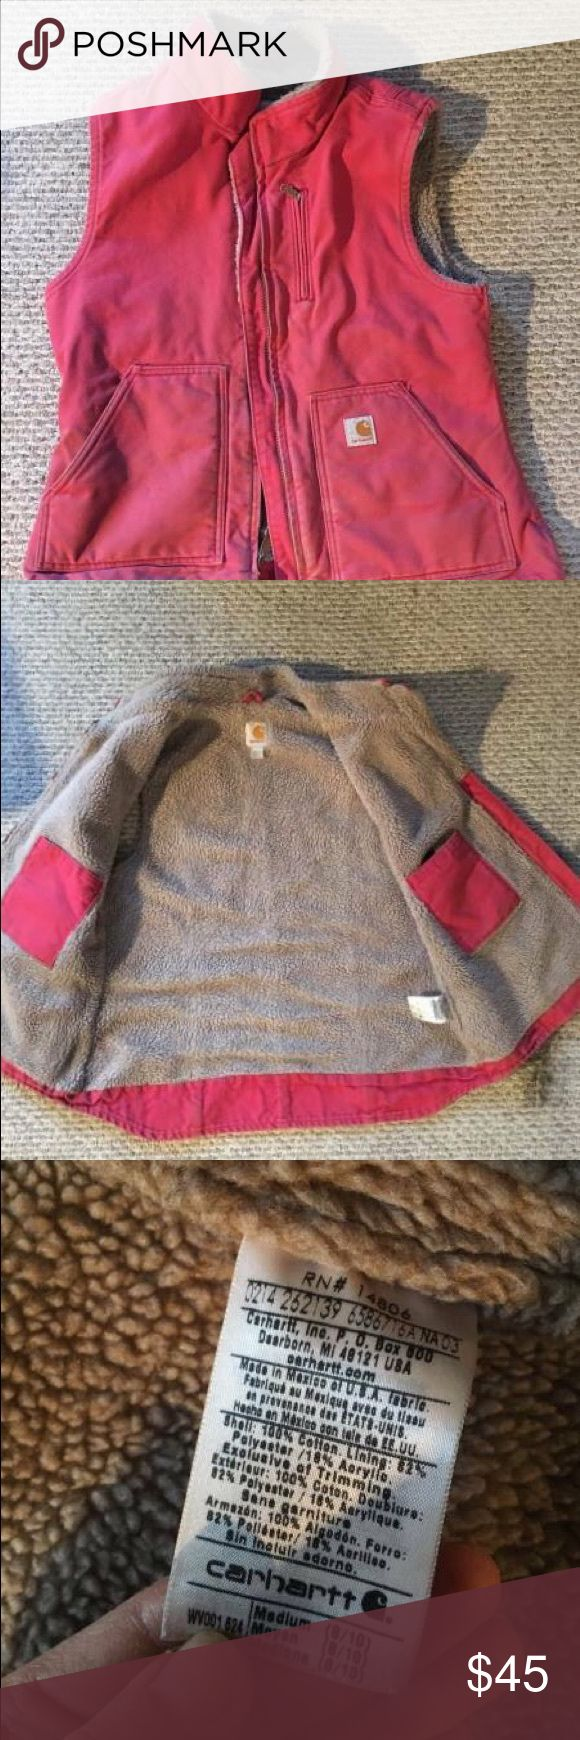 Women's Carhartt Sandstone Mock Neck Vest Pink vest, excellent condition. Size medium - perfect over a bulkier jacket. Carhartt Jackets & Coats Vests